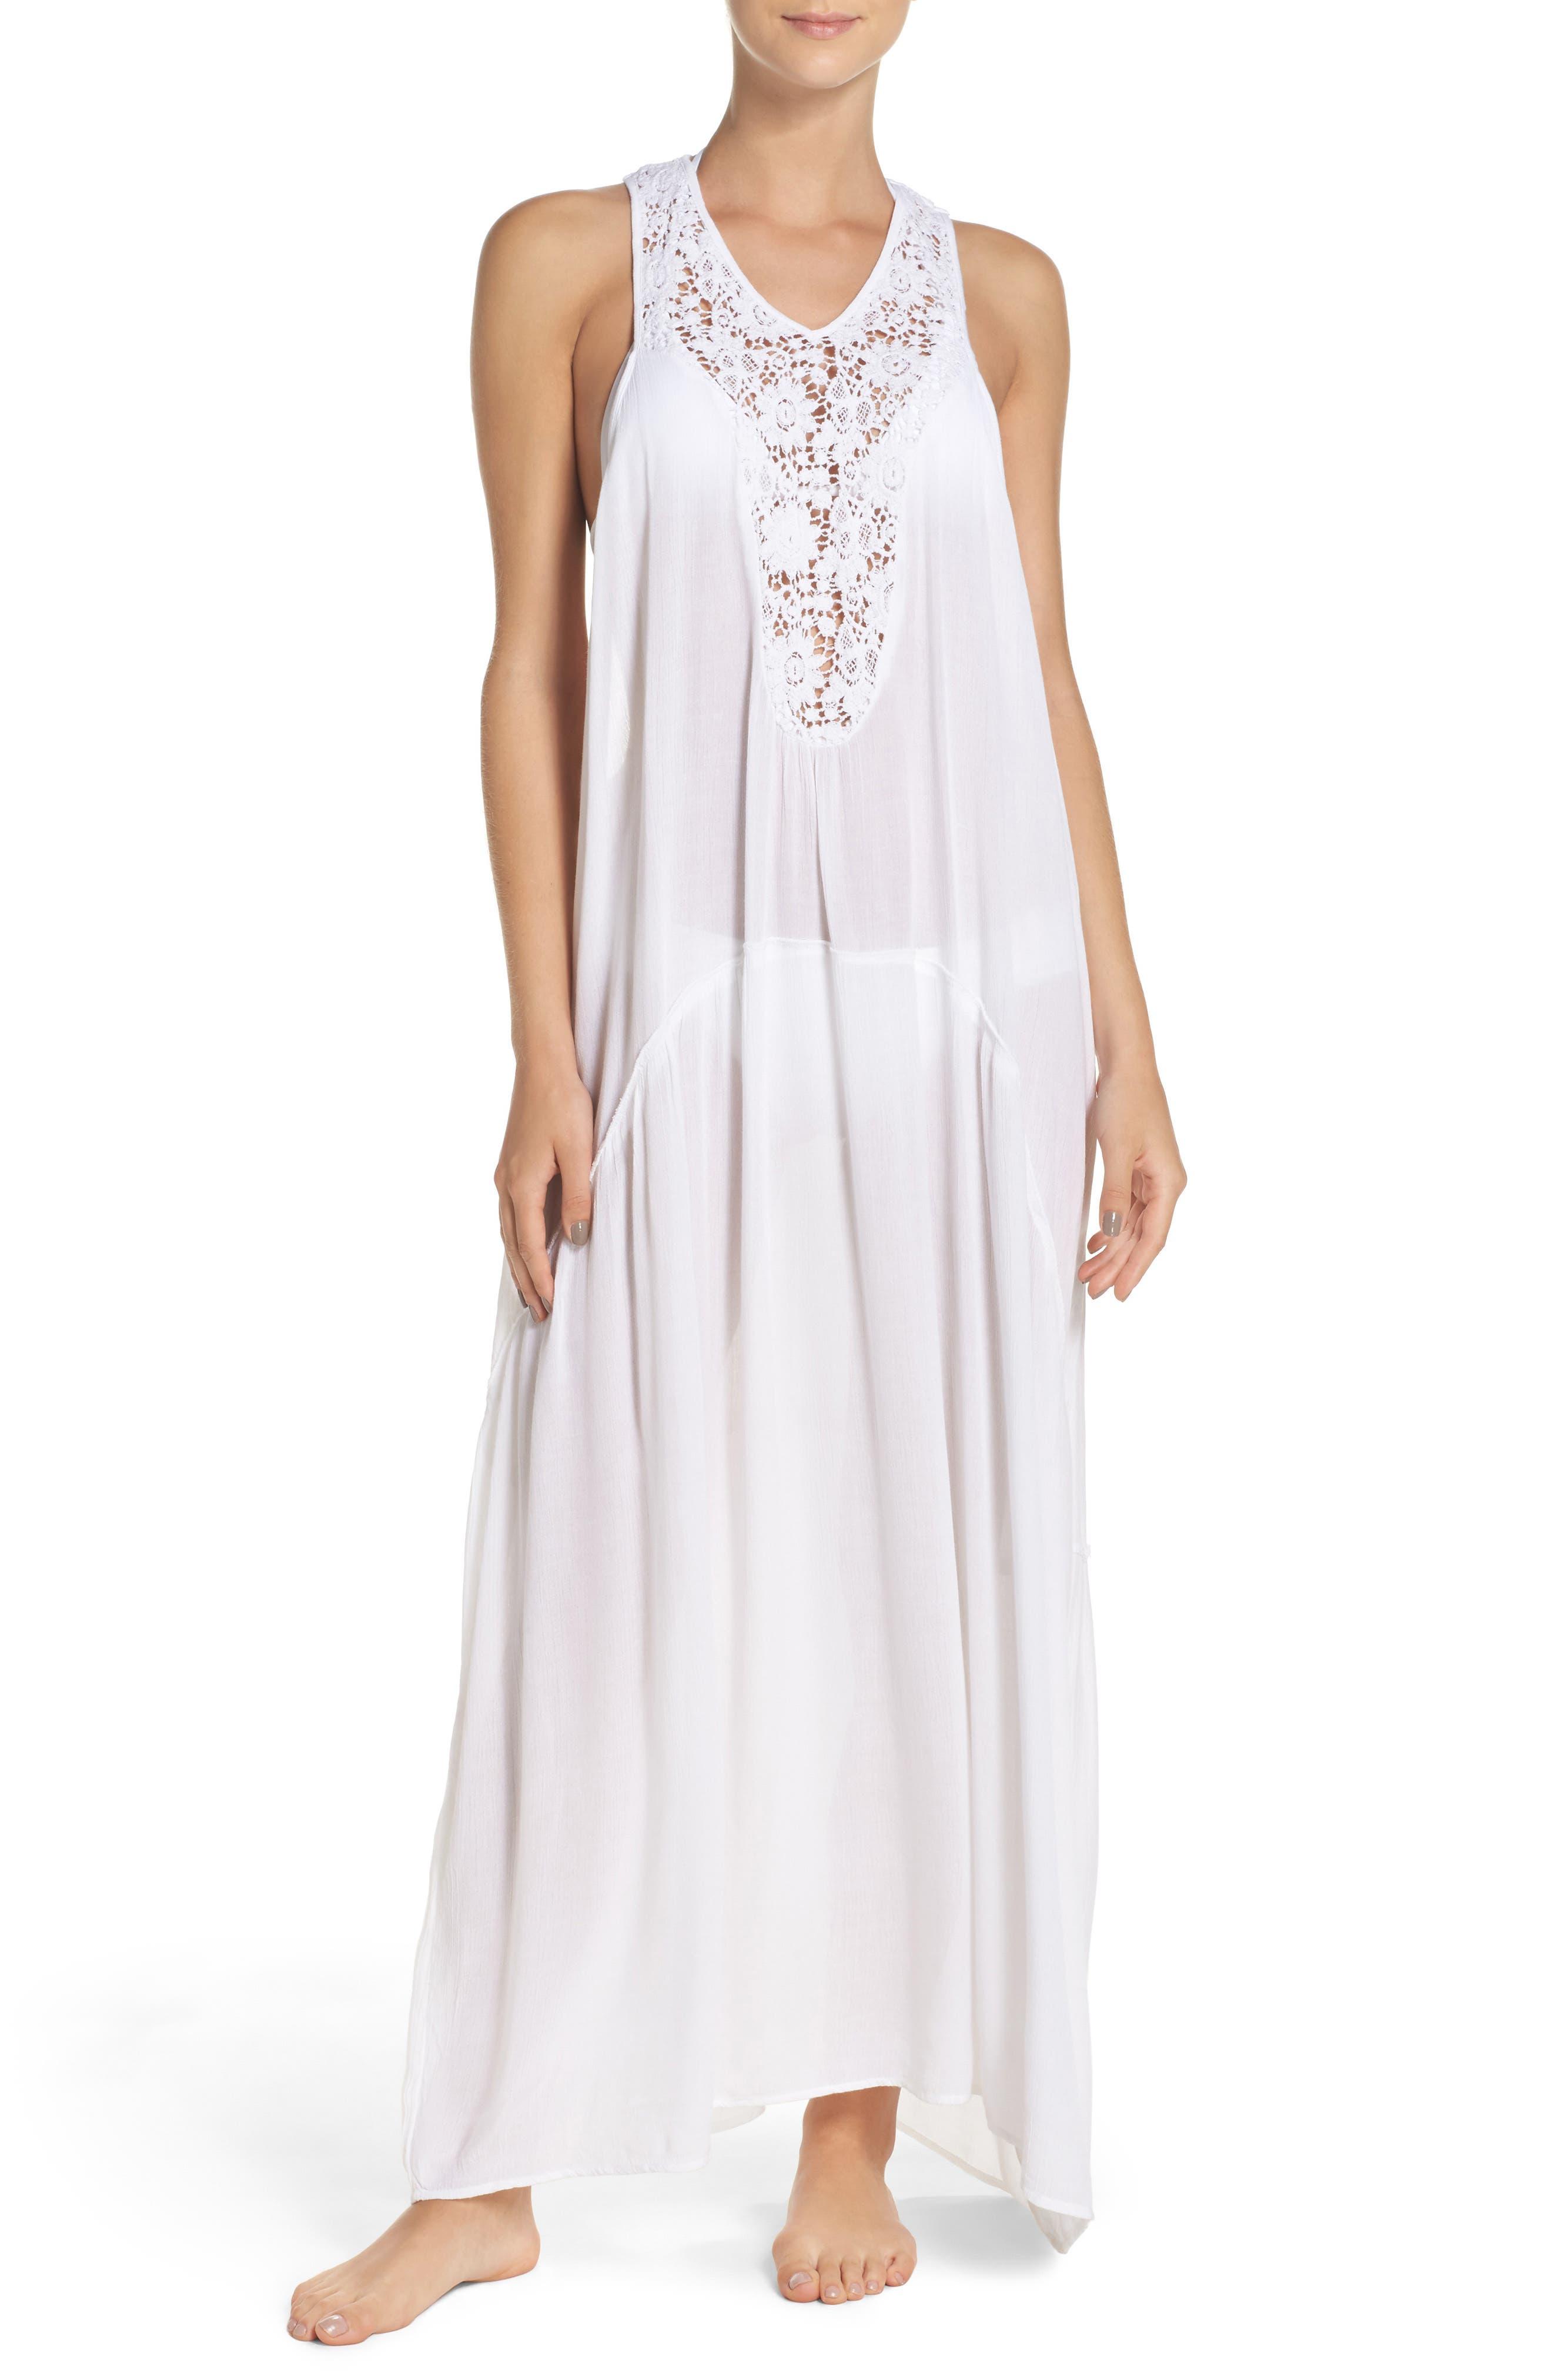 Alternate Image 1 Selected - Muche et Muchette Cover-Up Dress